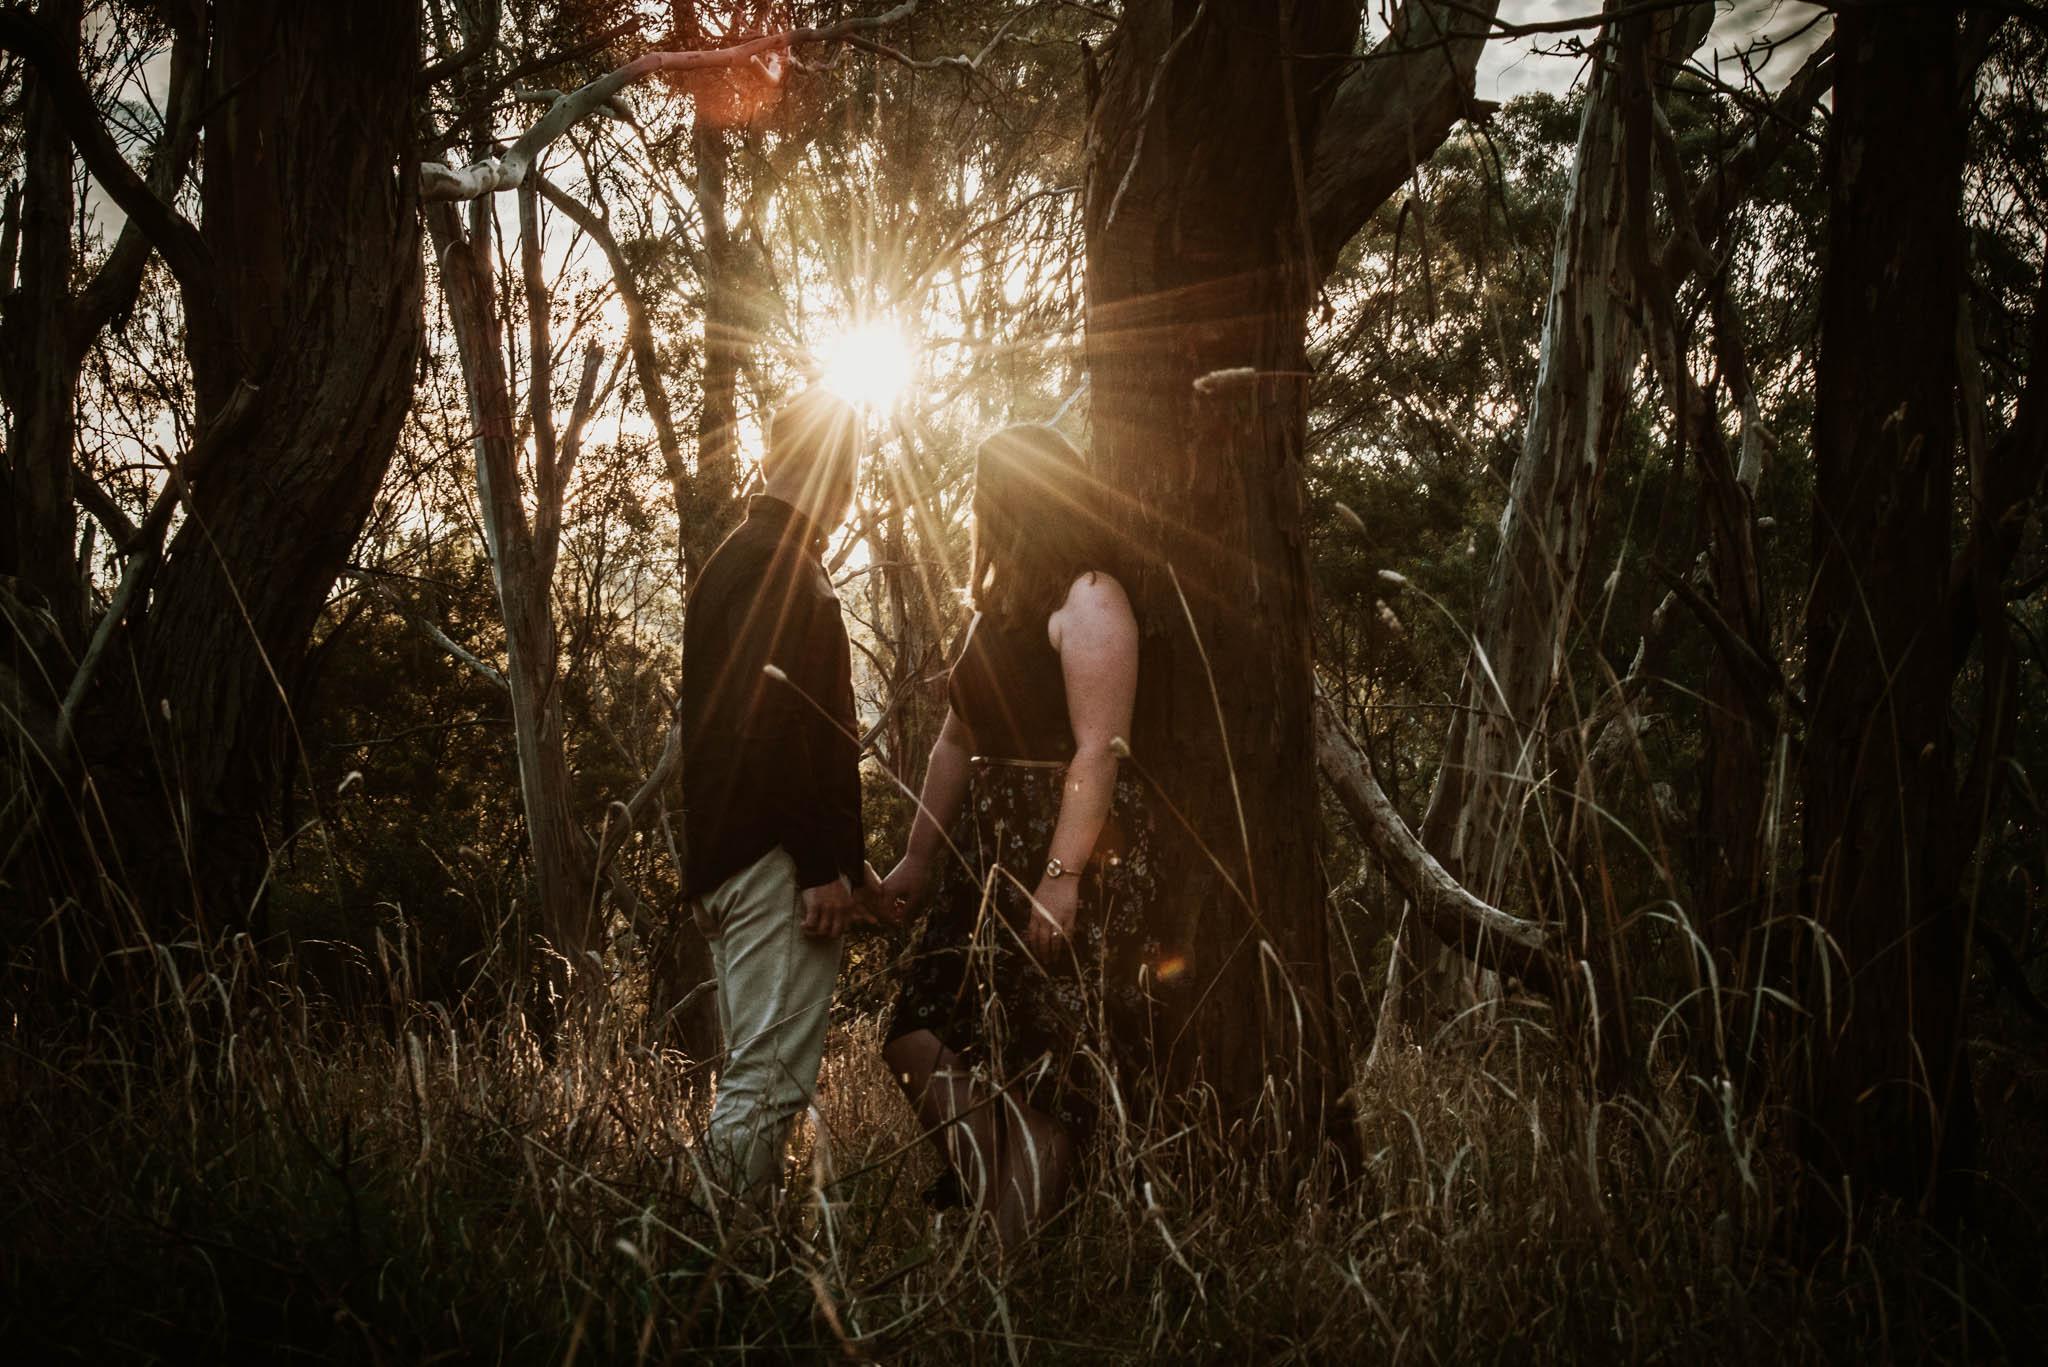 launceston couples photographer-5.jpg